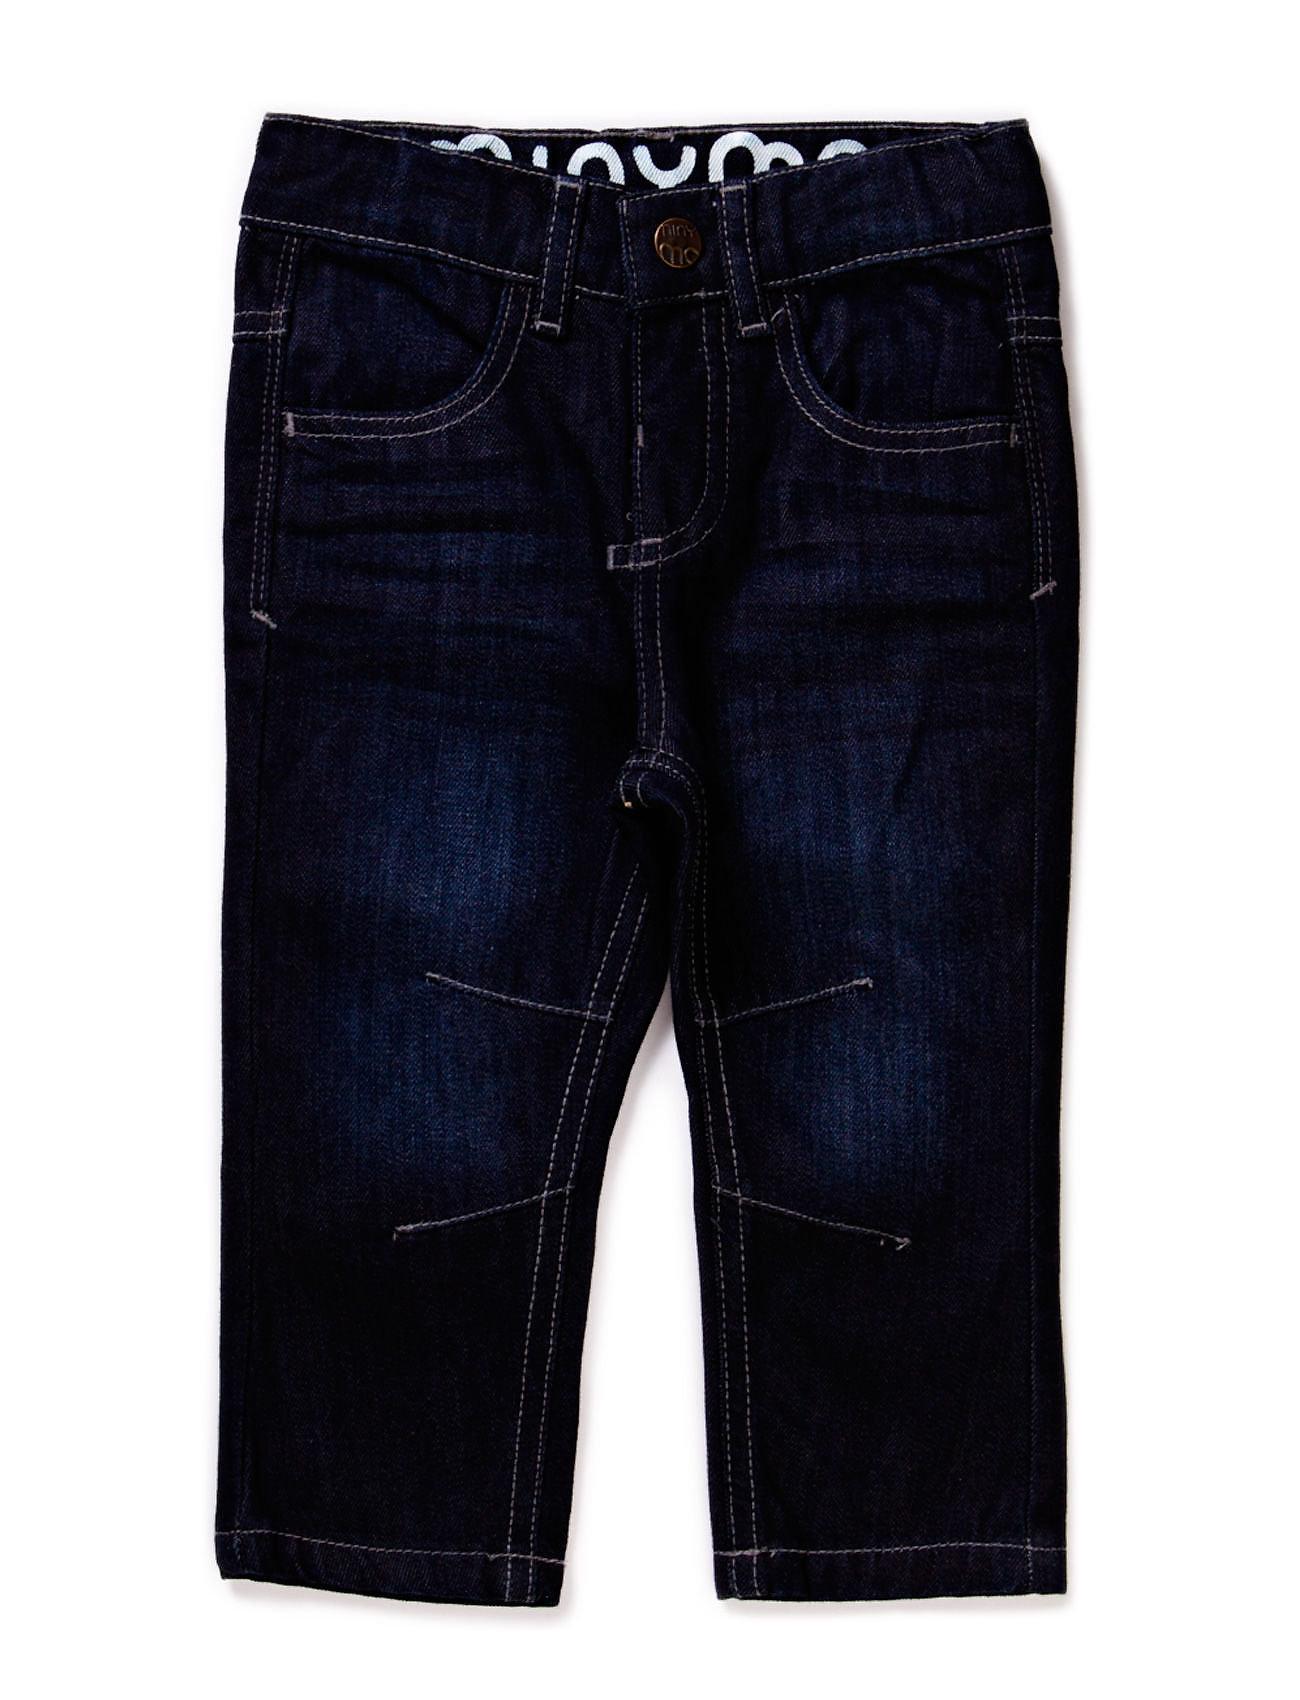 Minymo Jeans boy - Regular engineer - DARK BLUE DENIM